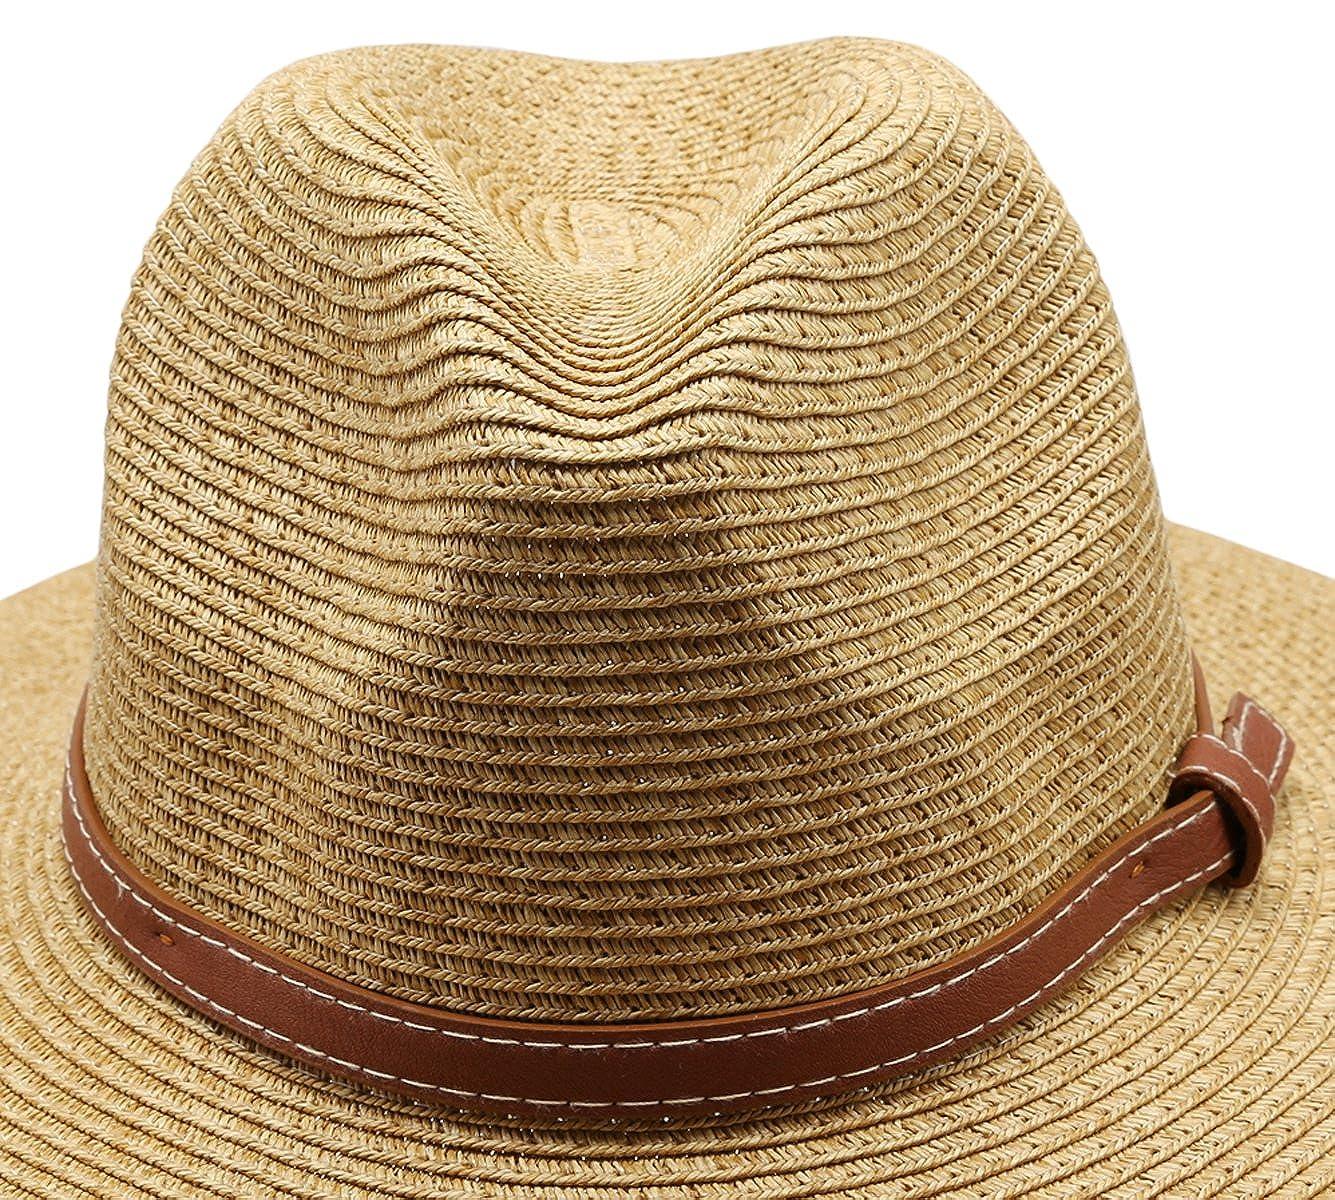 8c3f07dffe2 Women s Braid Straw Wide Brim Classic Fedora Sun Hat UPF 50+ with  Adjustable Drawstring (F2250